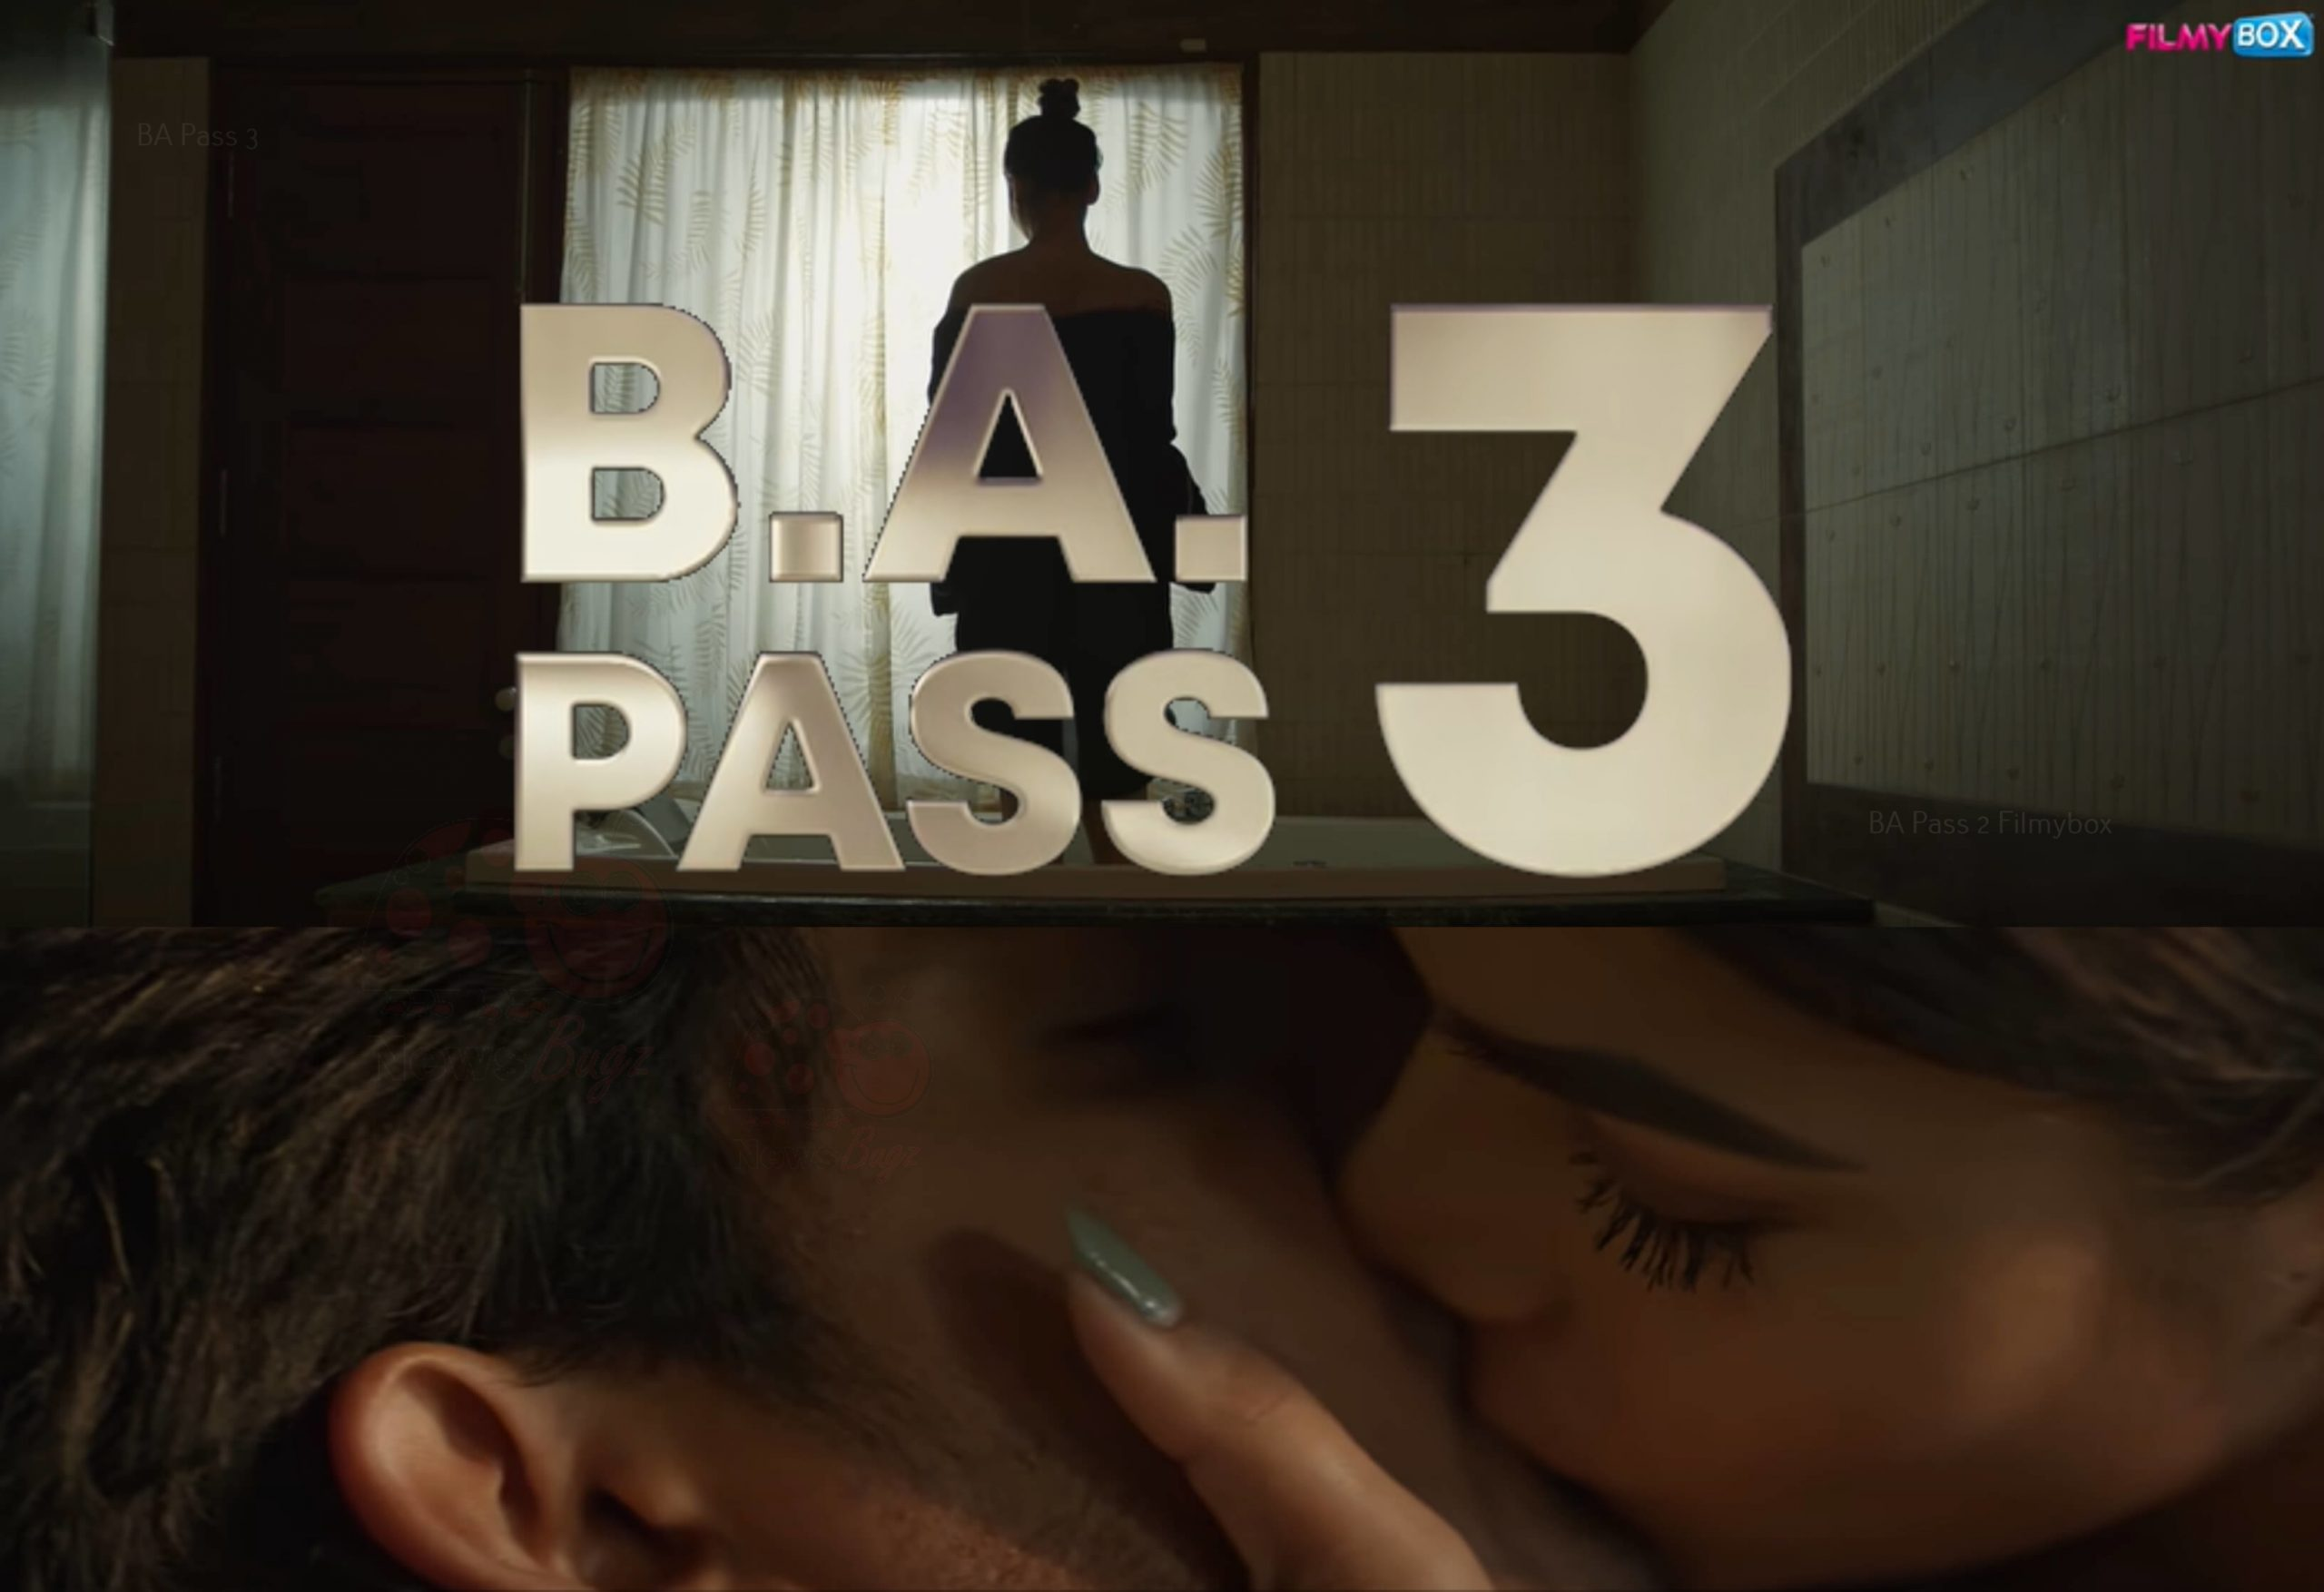 BA Pass 3